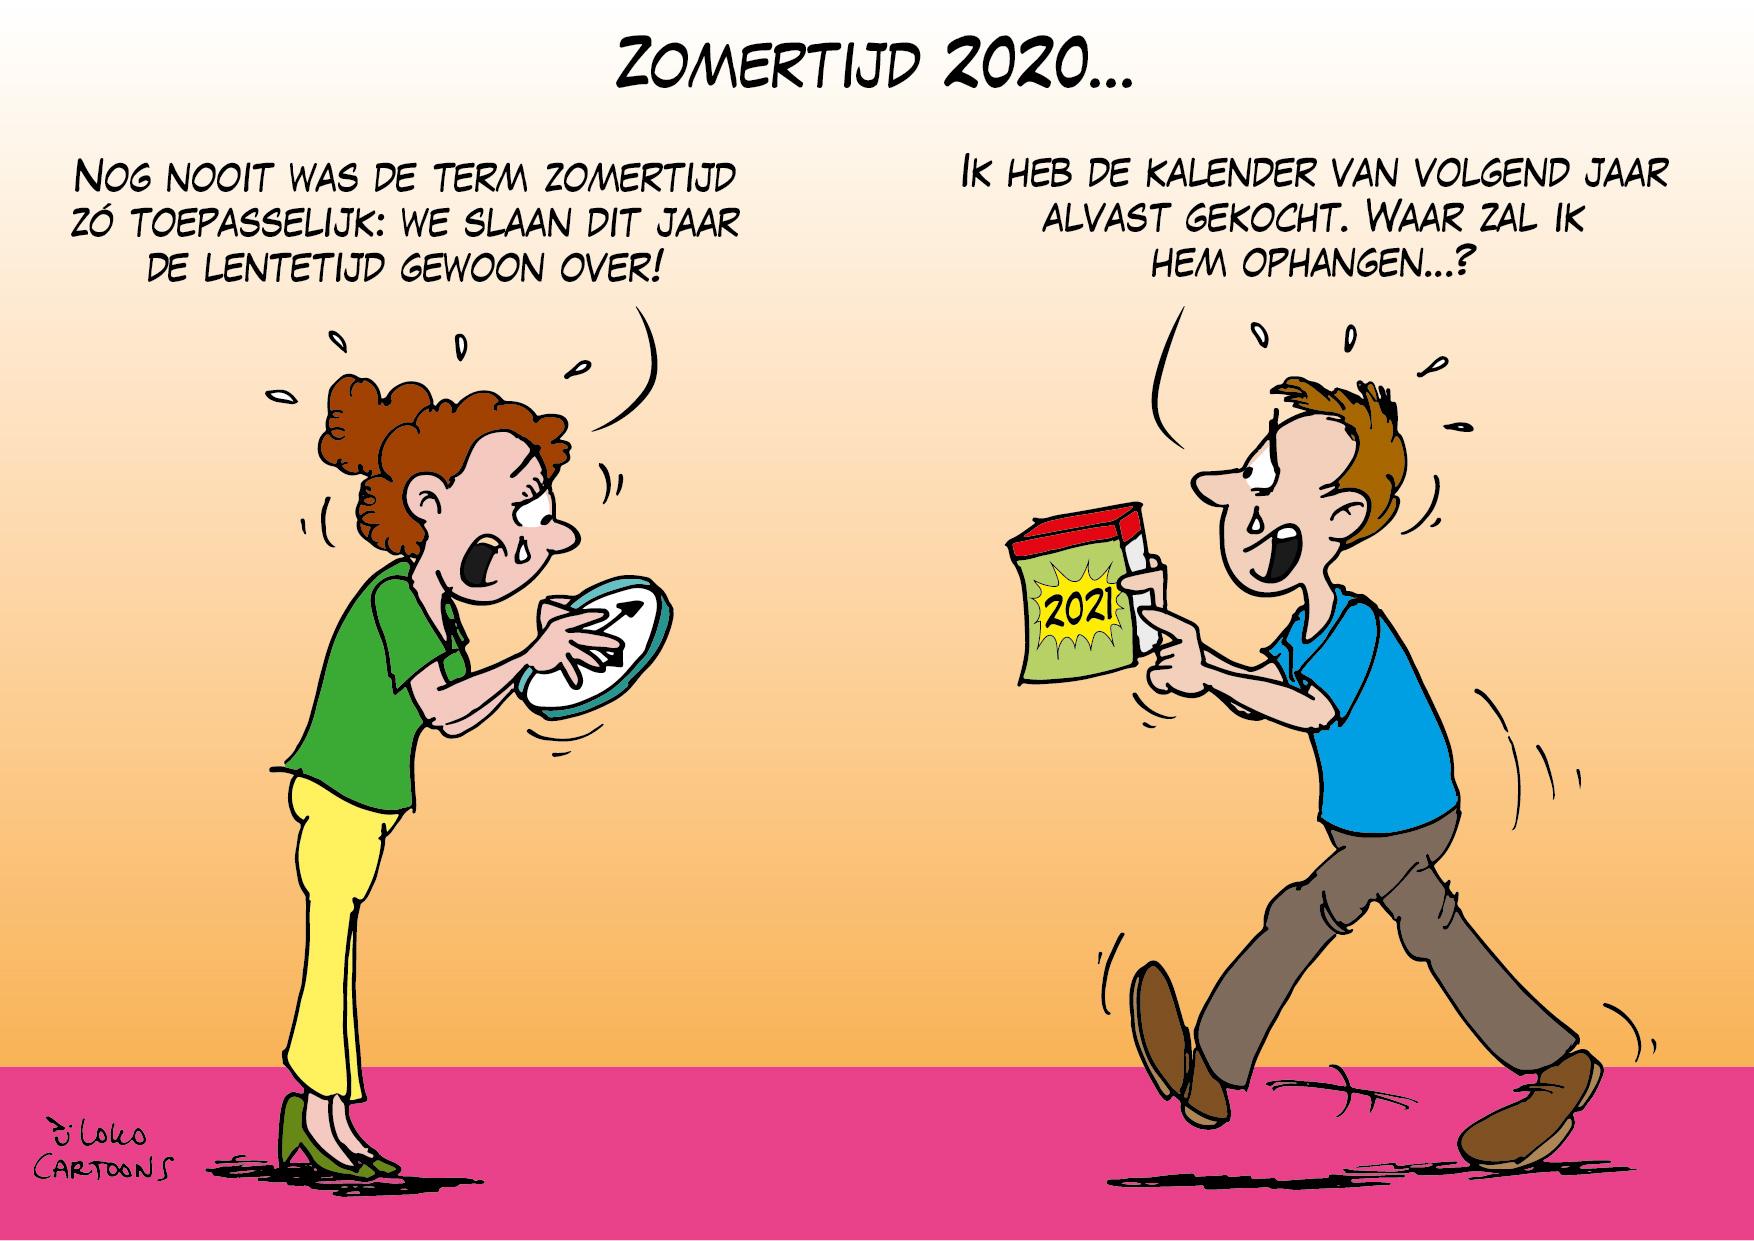 Zomertijd 2020…